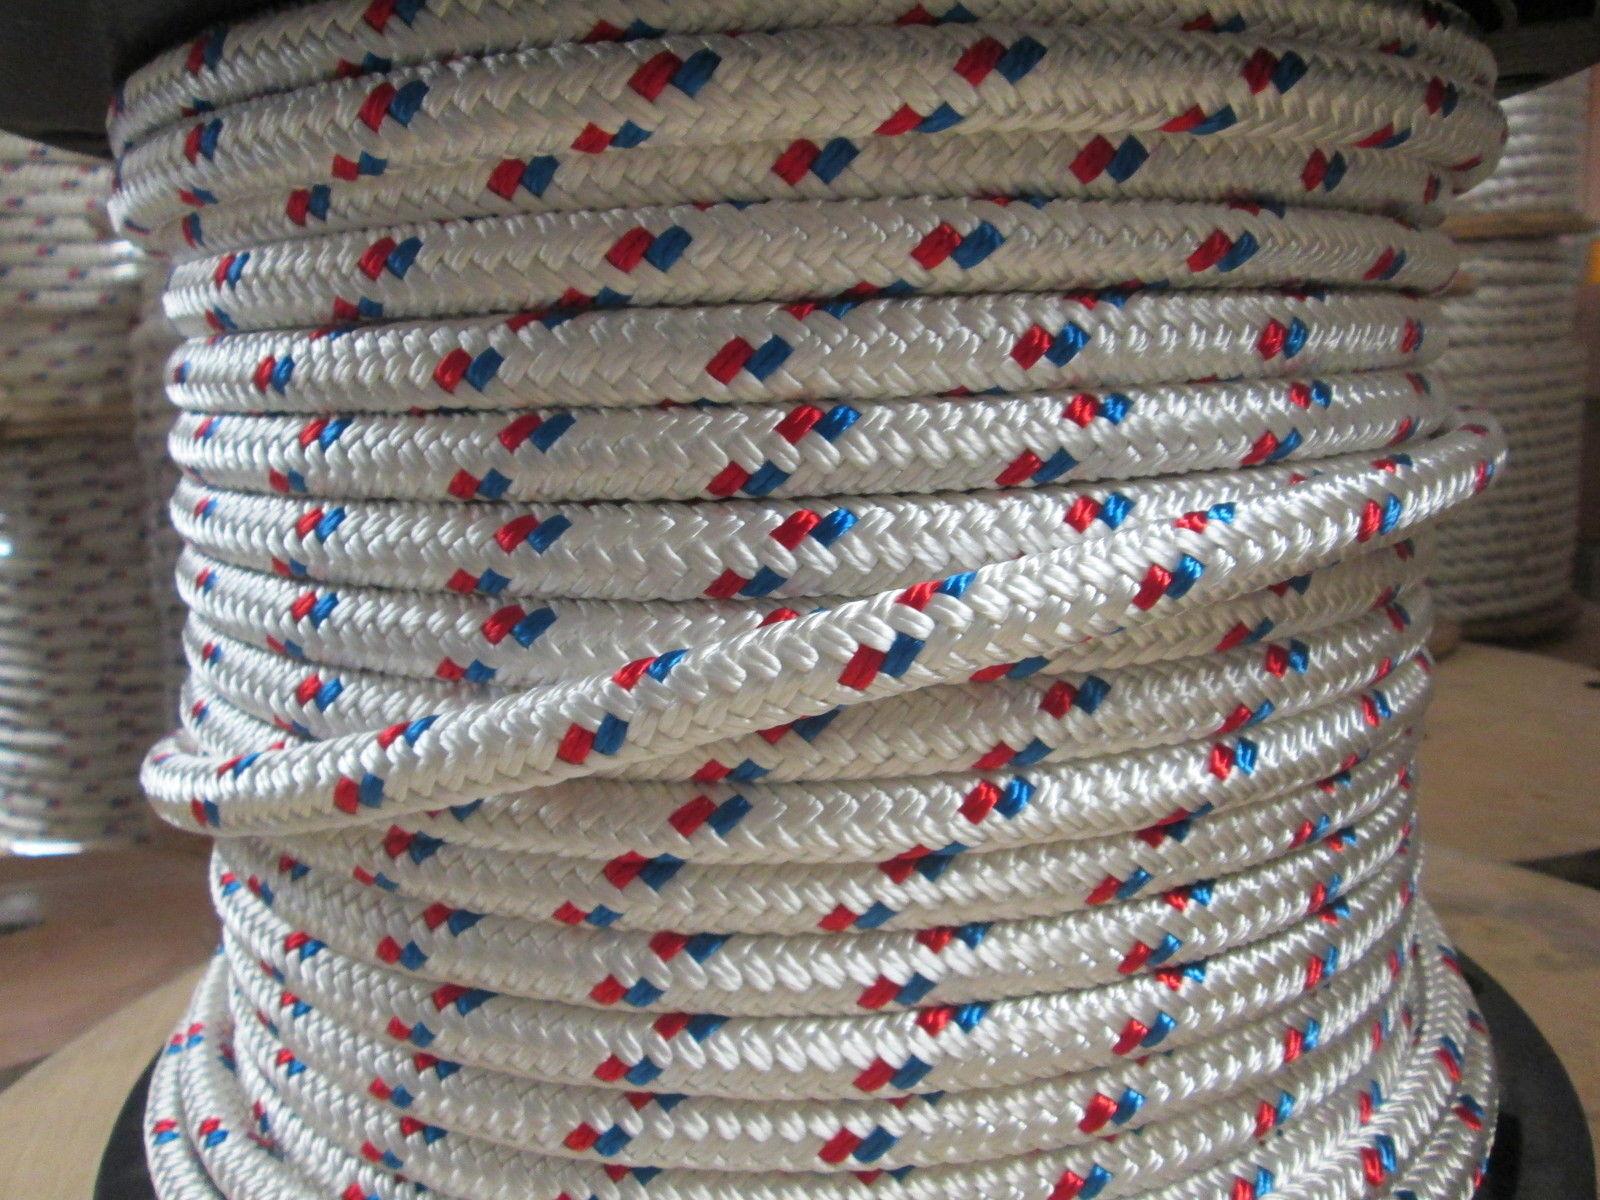 Tree Boss Arborist Rope, MAIN LINE Bull ROPE,10,700 Lb   Rope,9 16  x 150'  USA